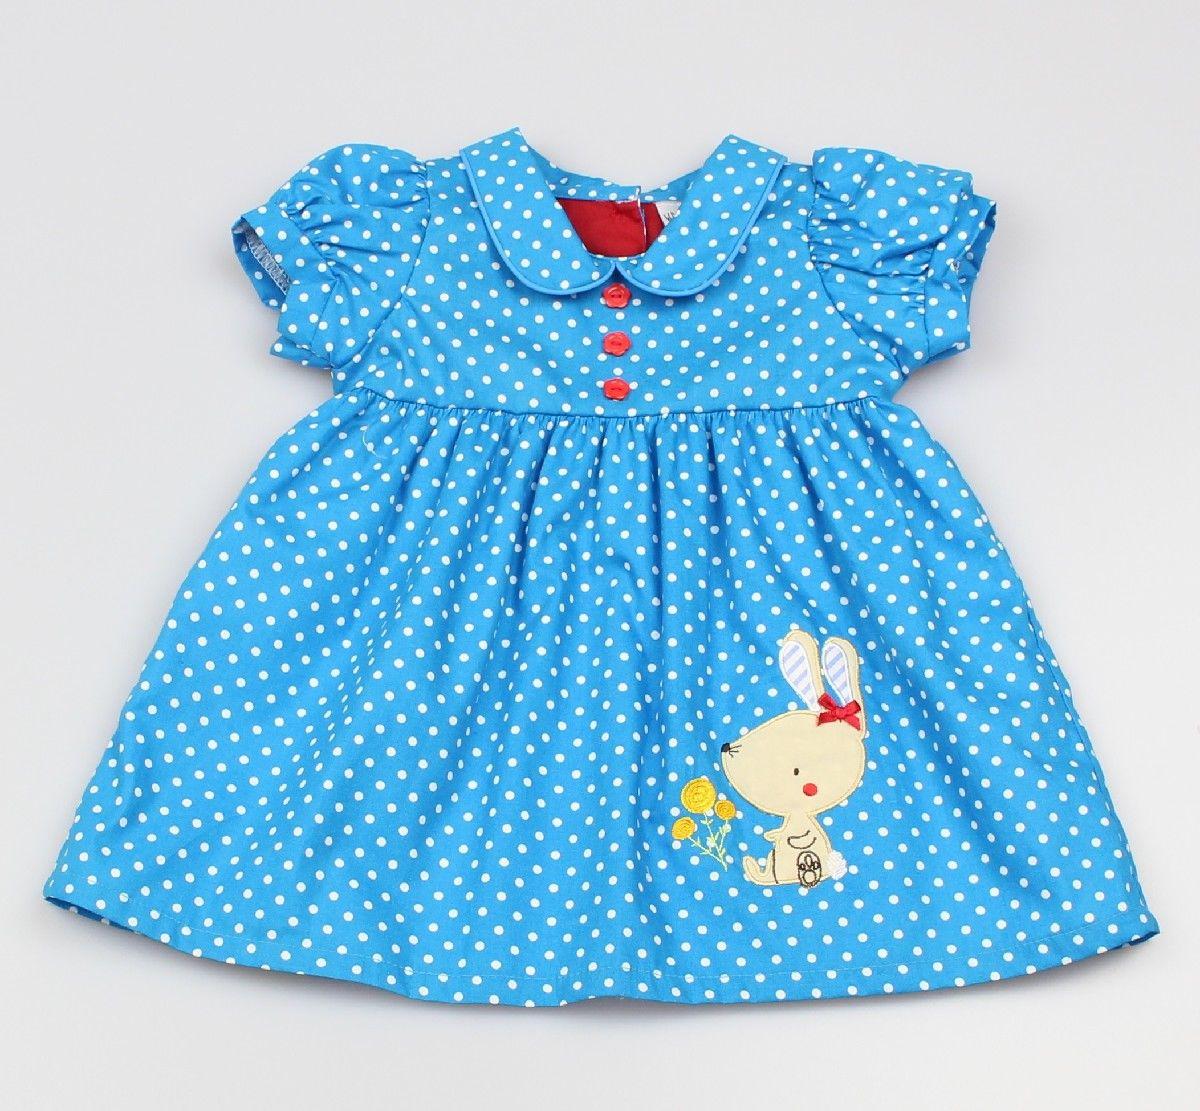 AOP Dress Lined Bright Blue/Polka Dots